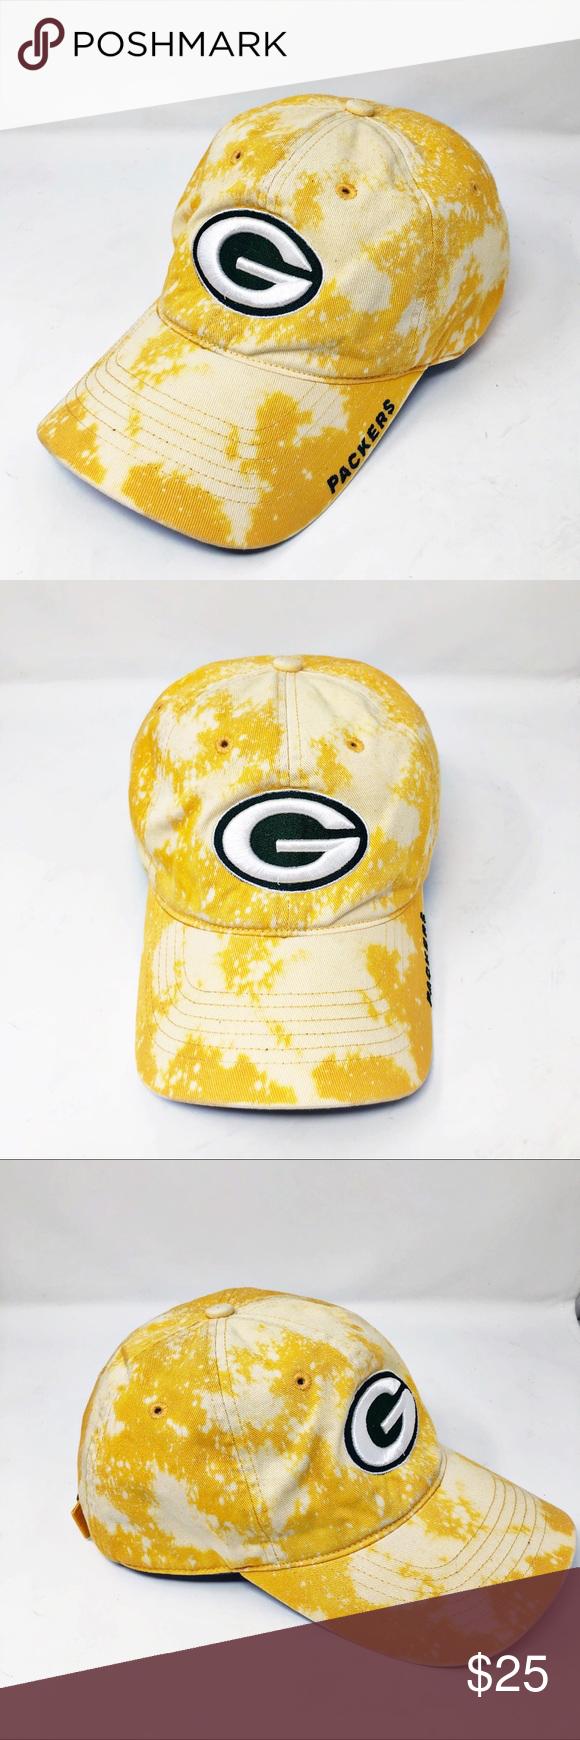 Reebok Green Bay Packers Bleach Splatter Hat Reebok Fitted Baseball Caps Green Bay